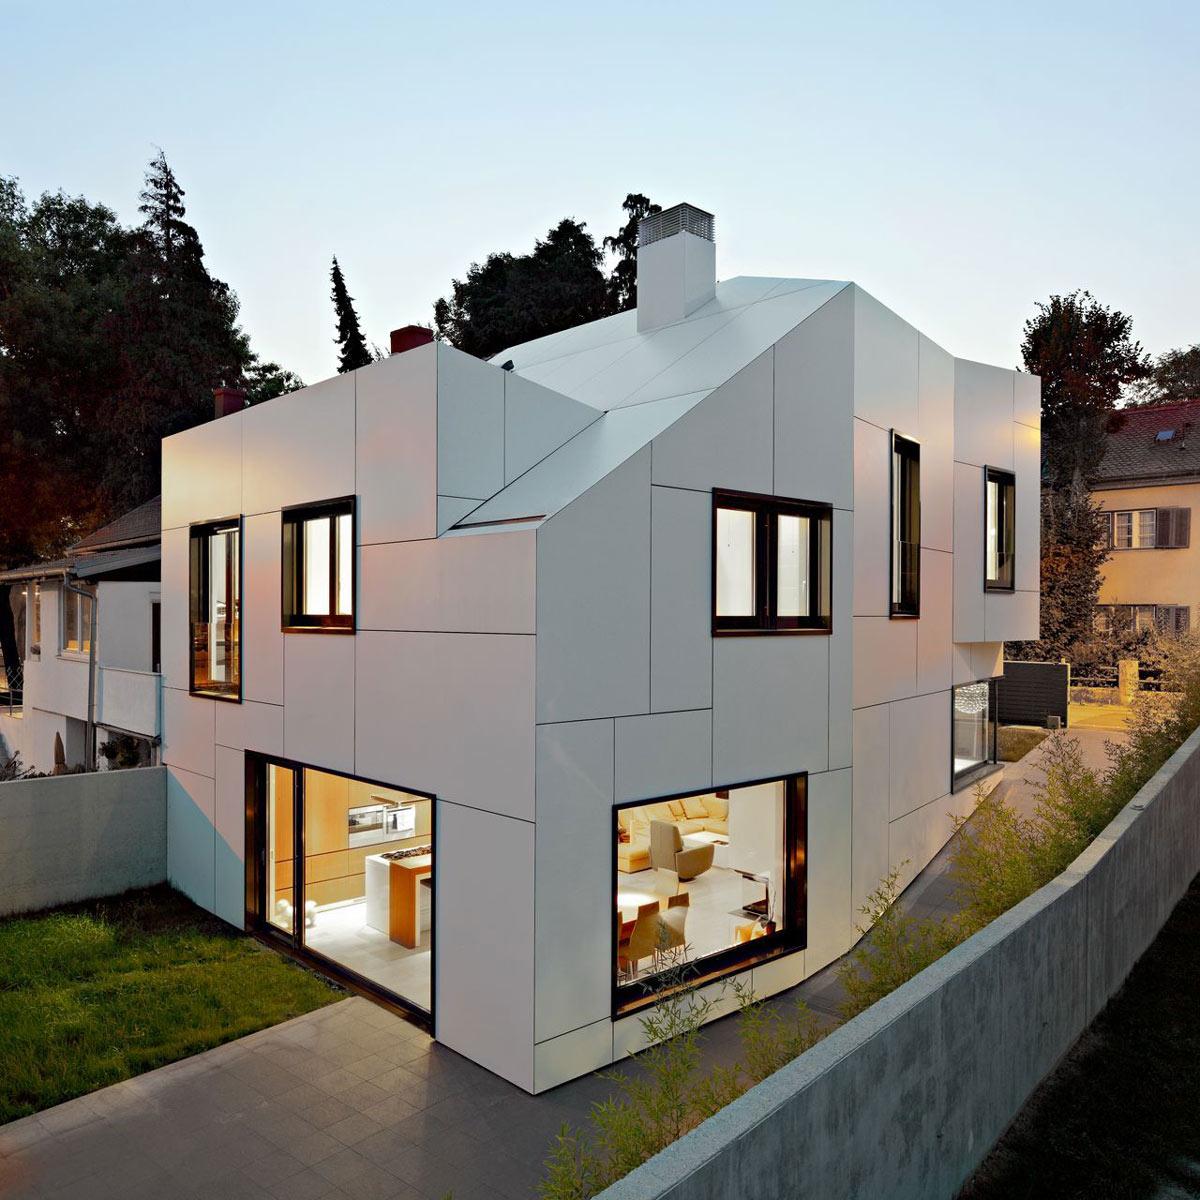 Garden, Terrace, A+A House in Zagreb, Croatia by DVA Arhitekta